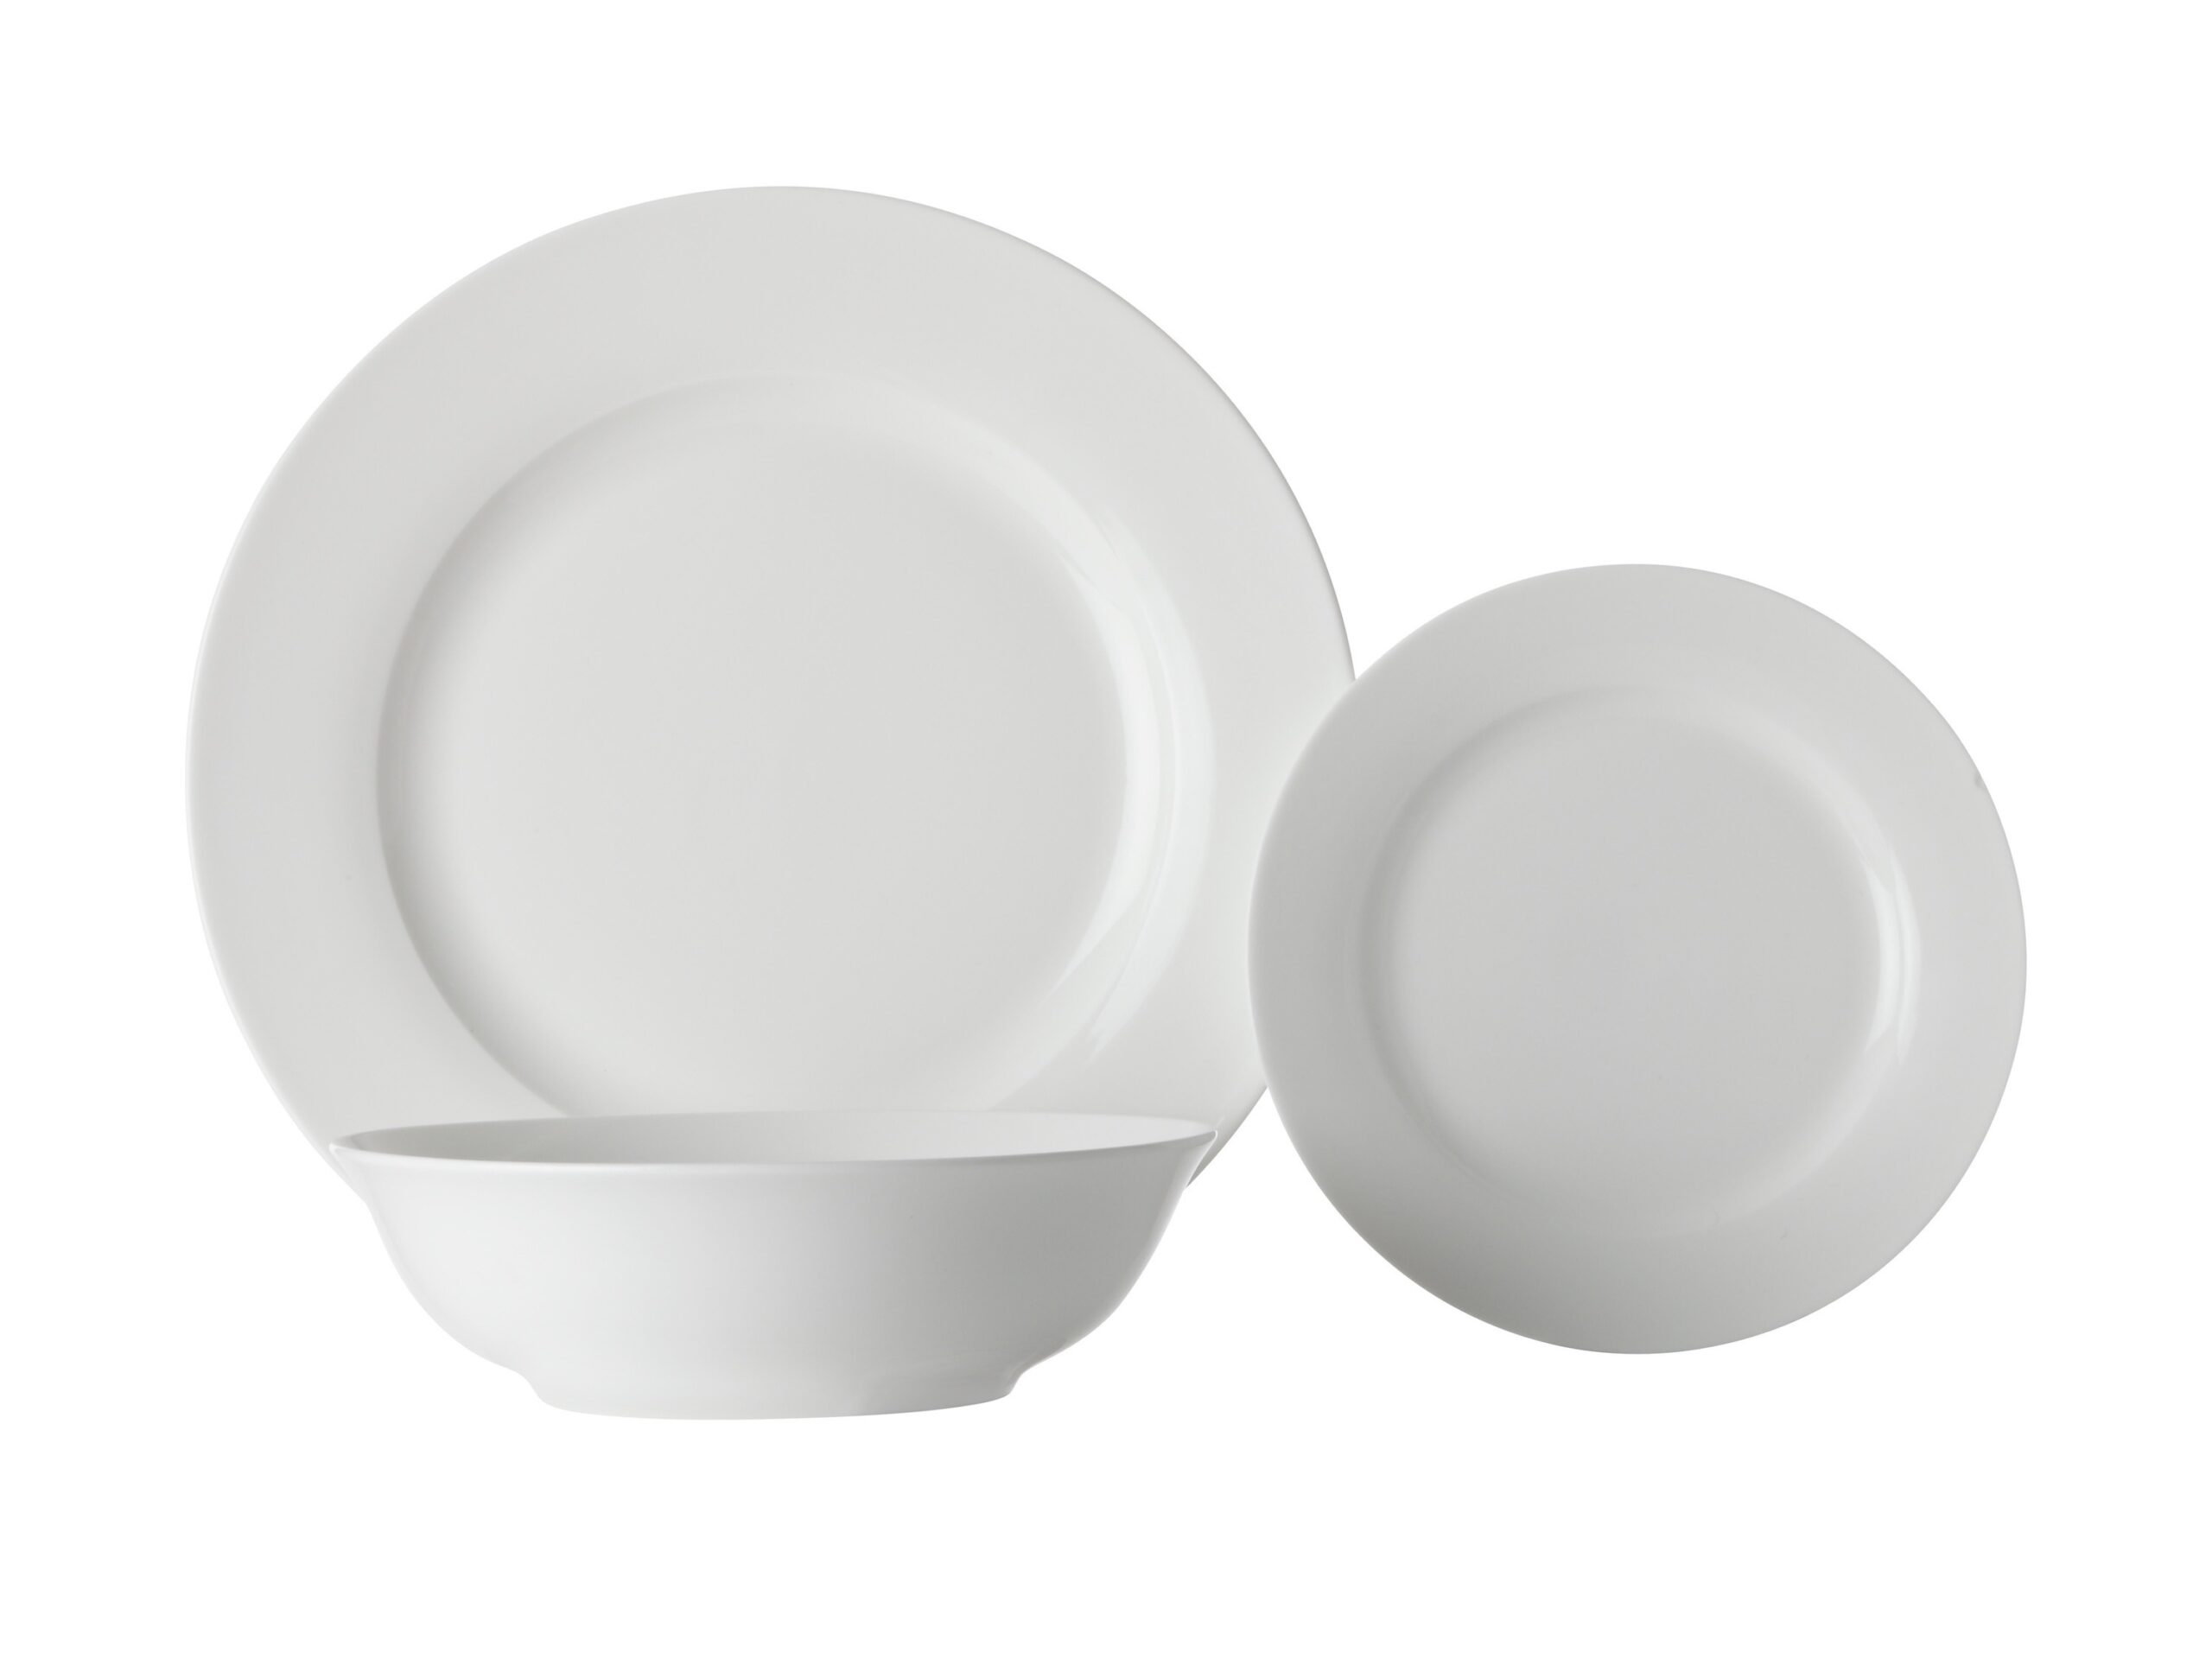 Maxwell Williams Euro Rim Dinner Set of 12 Piece